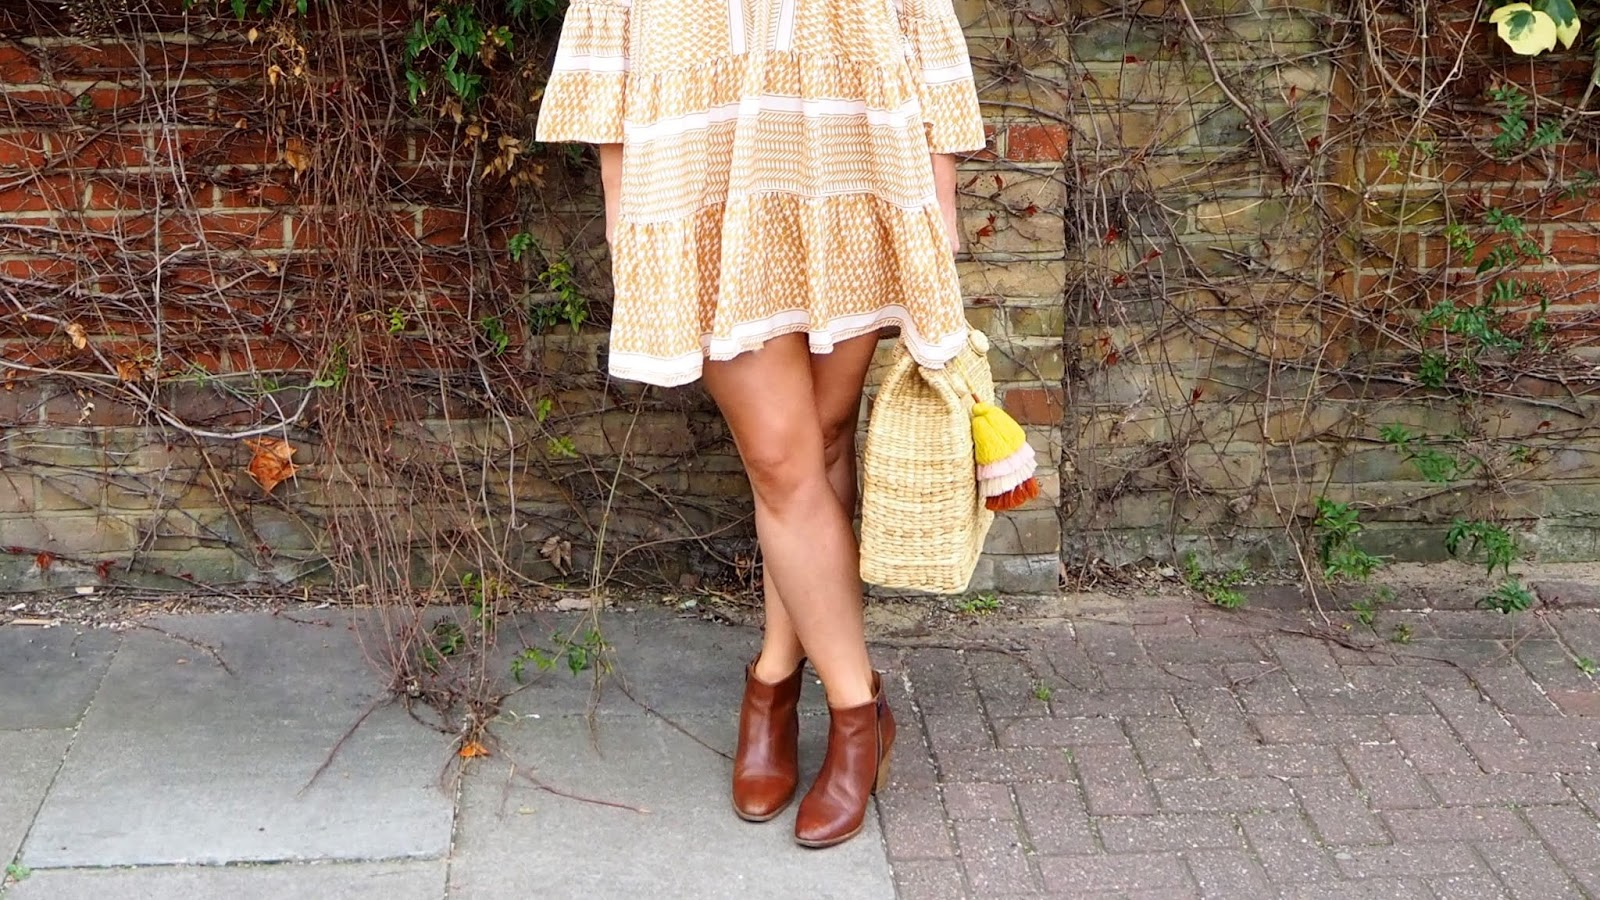 tan Legs in mini dress